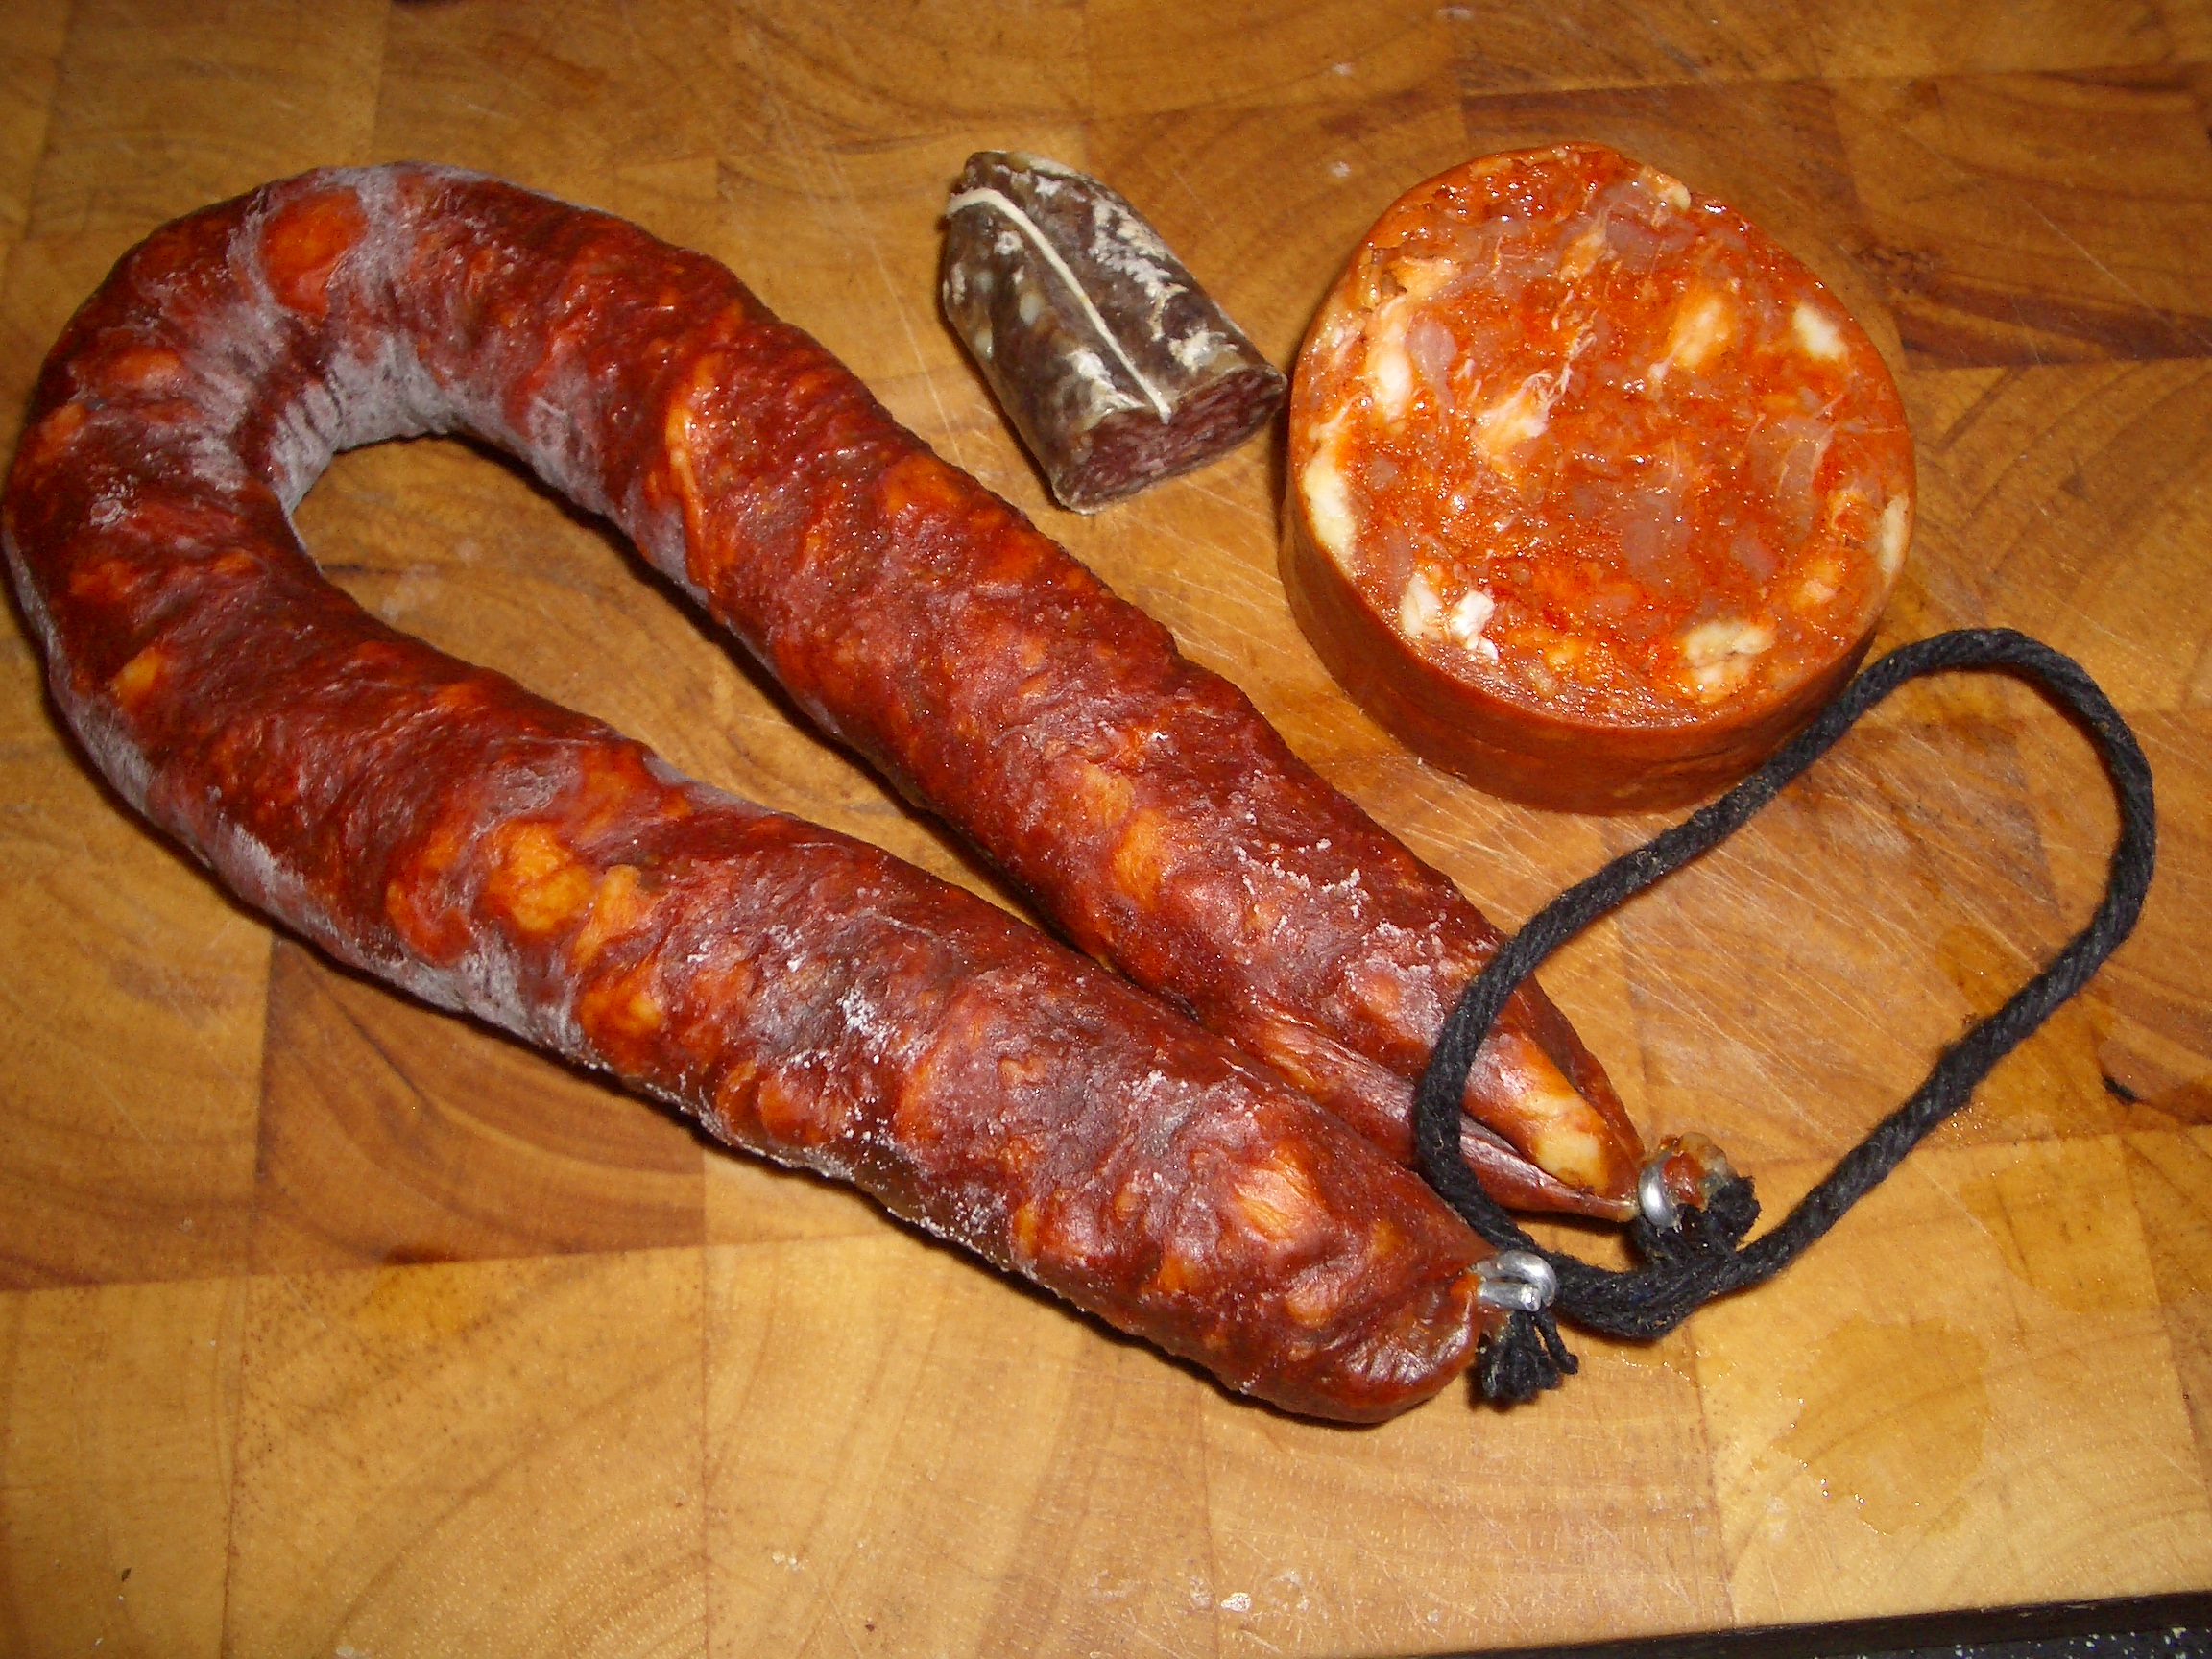 Lentil-and-chorizo-soup-monk-fish-and-chorizo-055.jpg